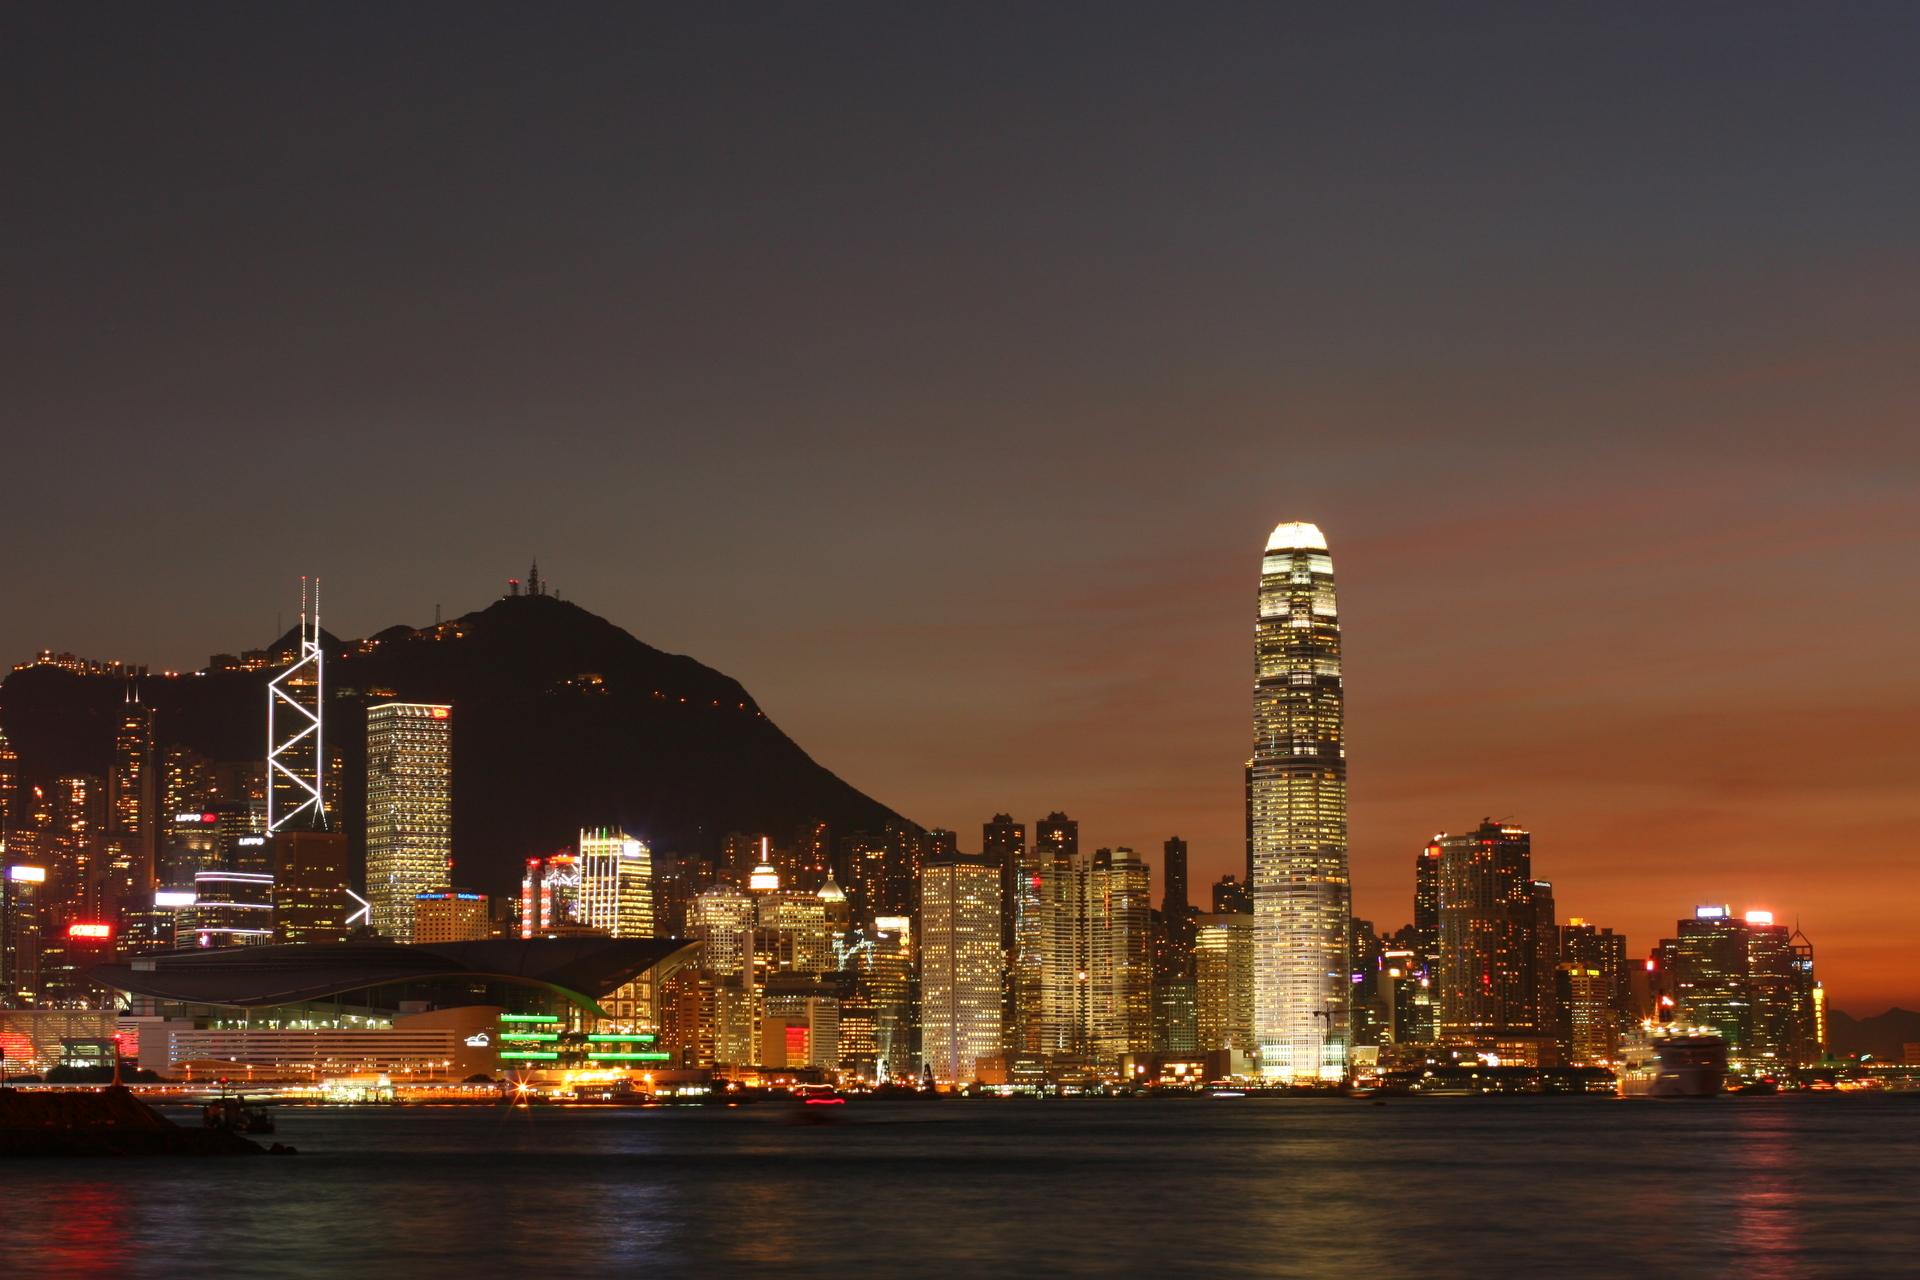 https://www.freeimages.com/photo/hong-kong-night-view-1227688 by Michael Pang - factasia.org pr